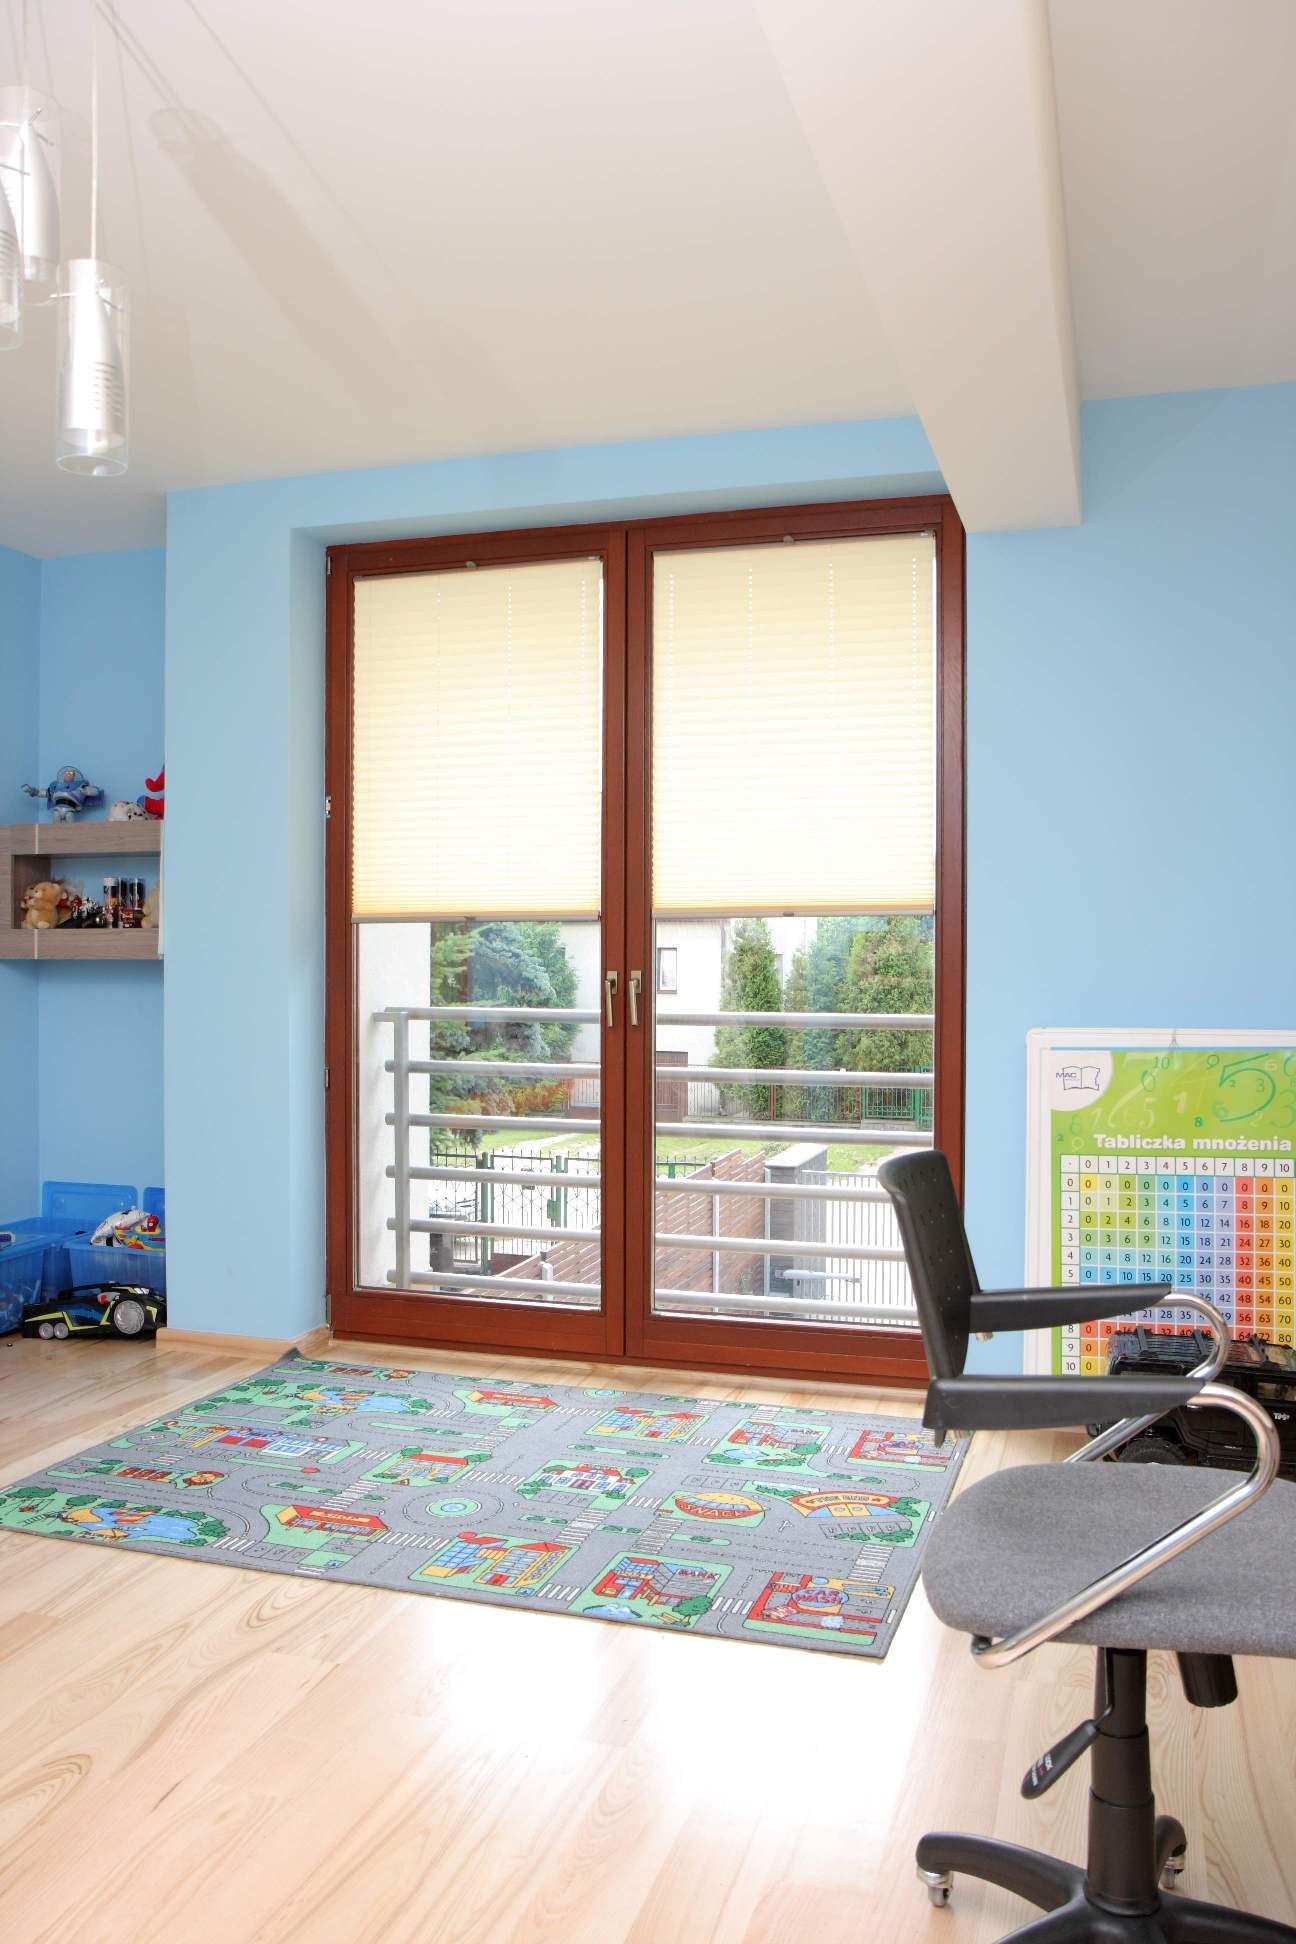 Idealne okno do pokoju malucha